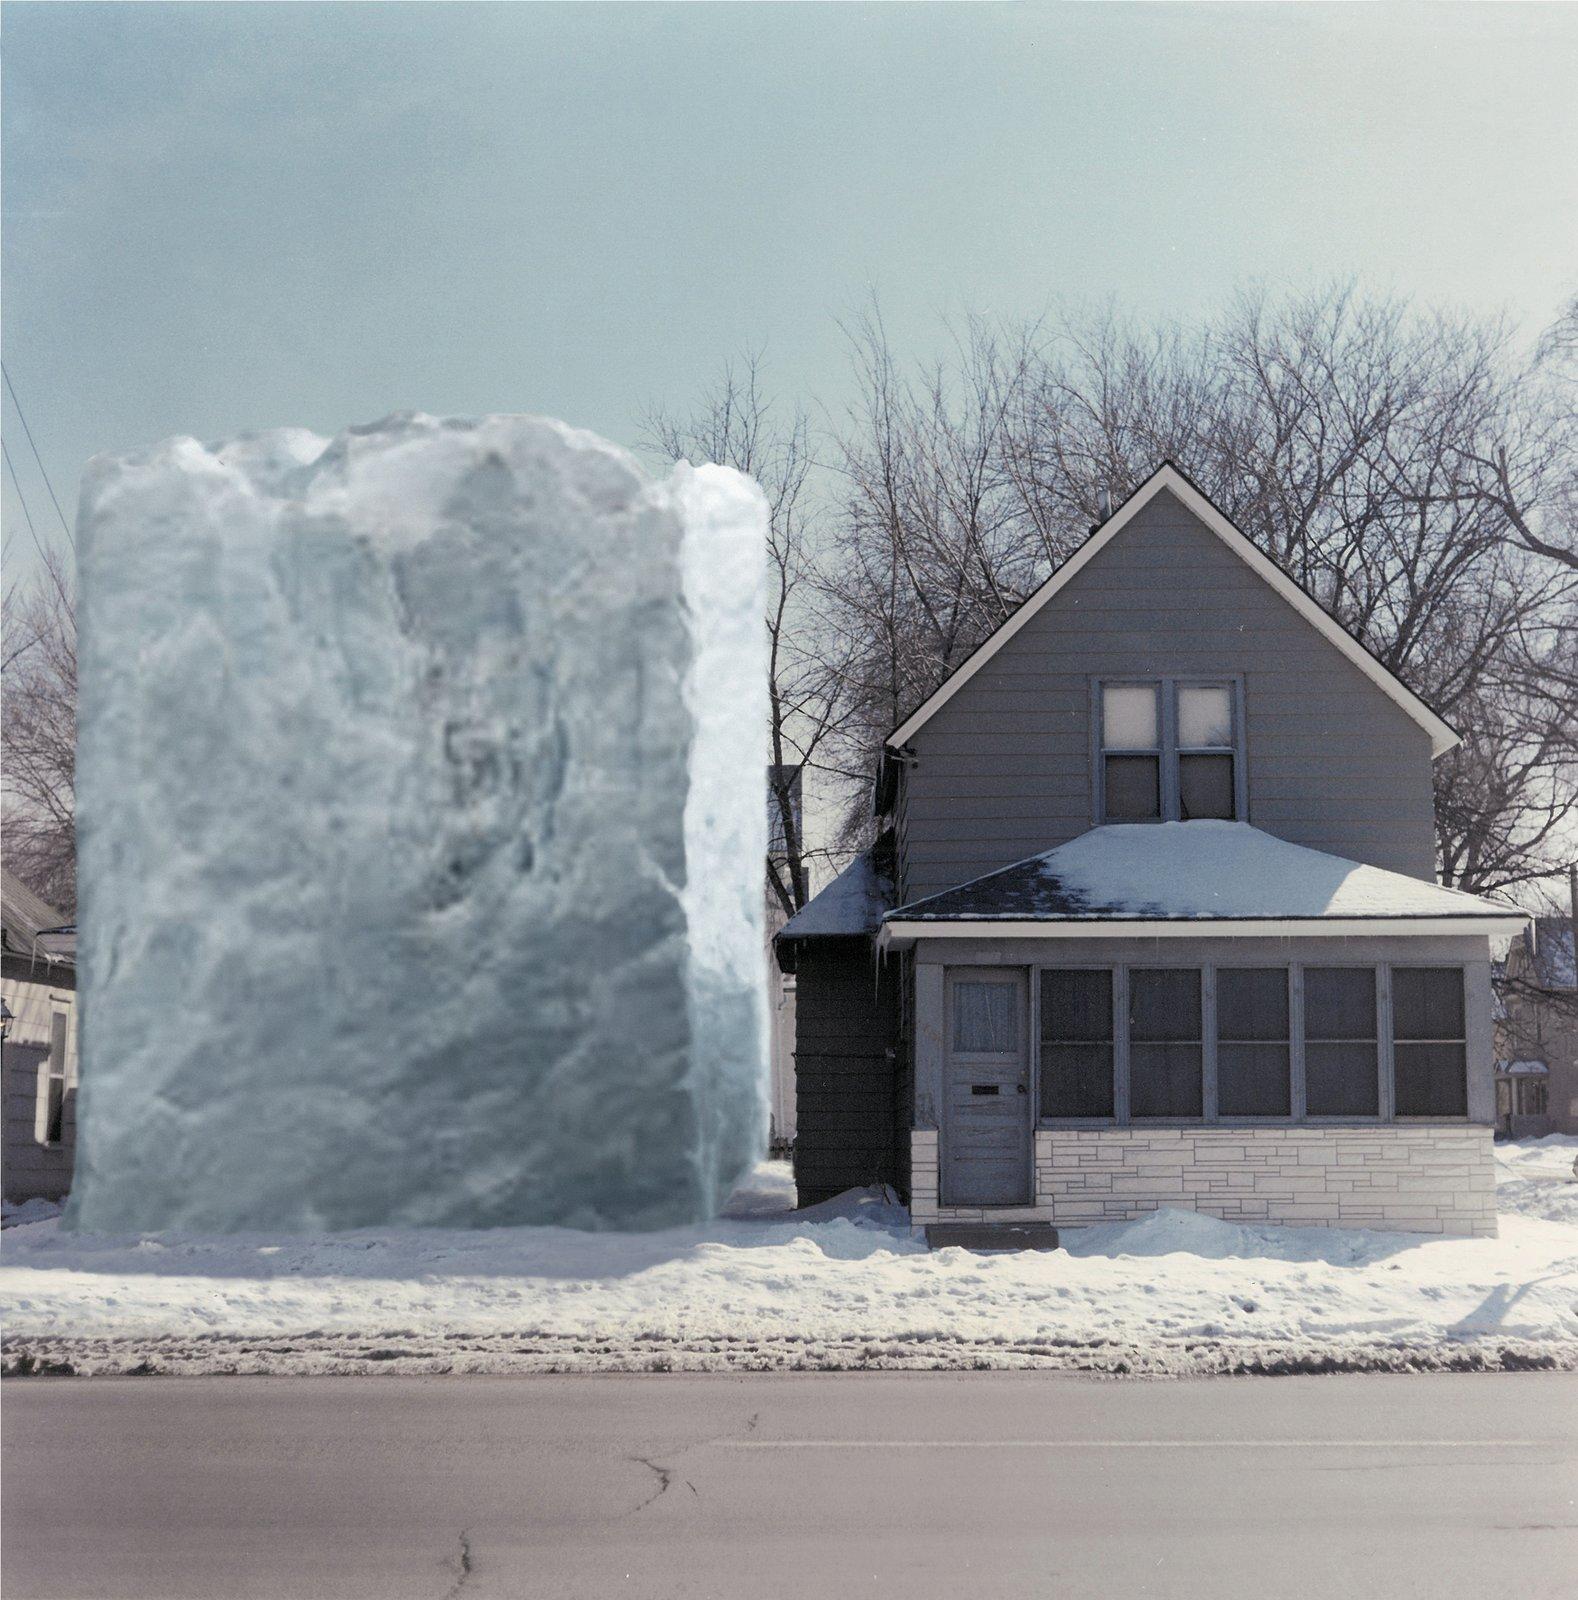 Ice House II, Minneapolis 1971, Gianni Pettena  Free Radicals by Chris Deam